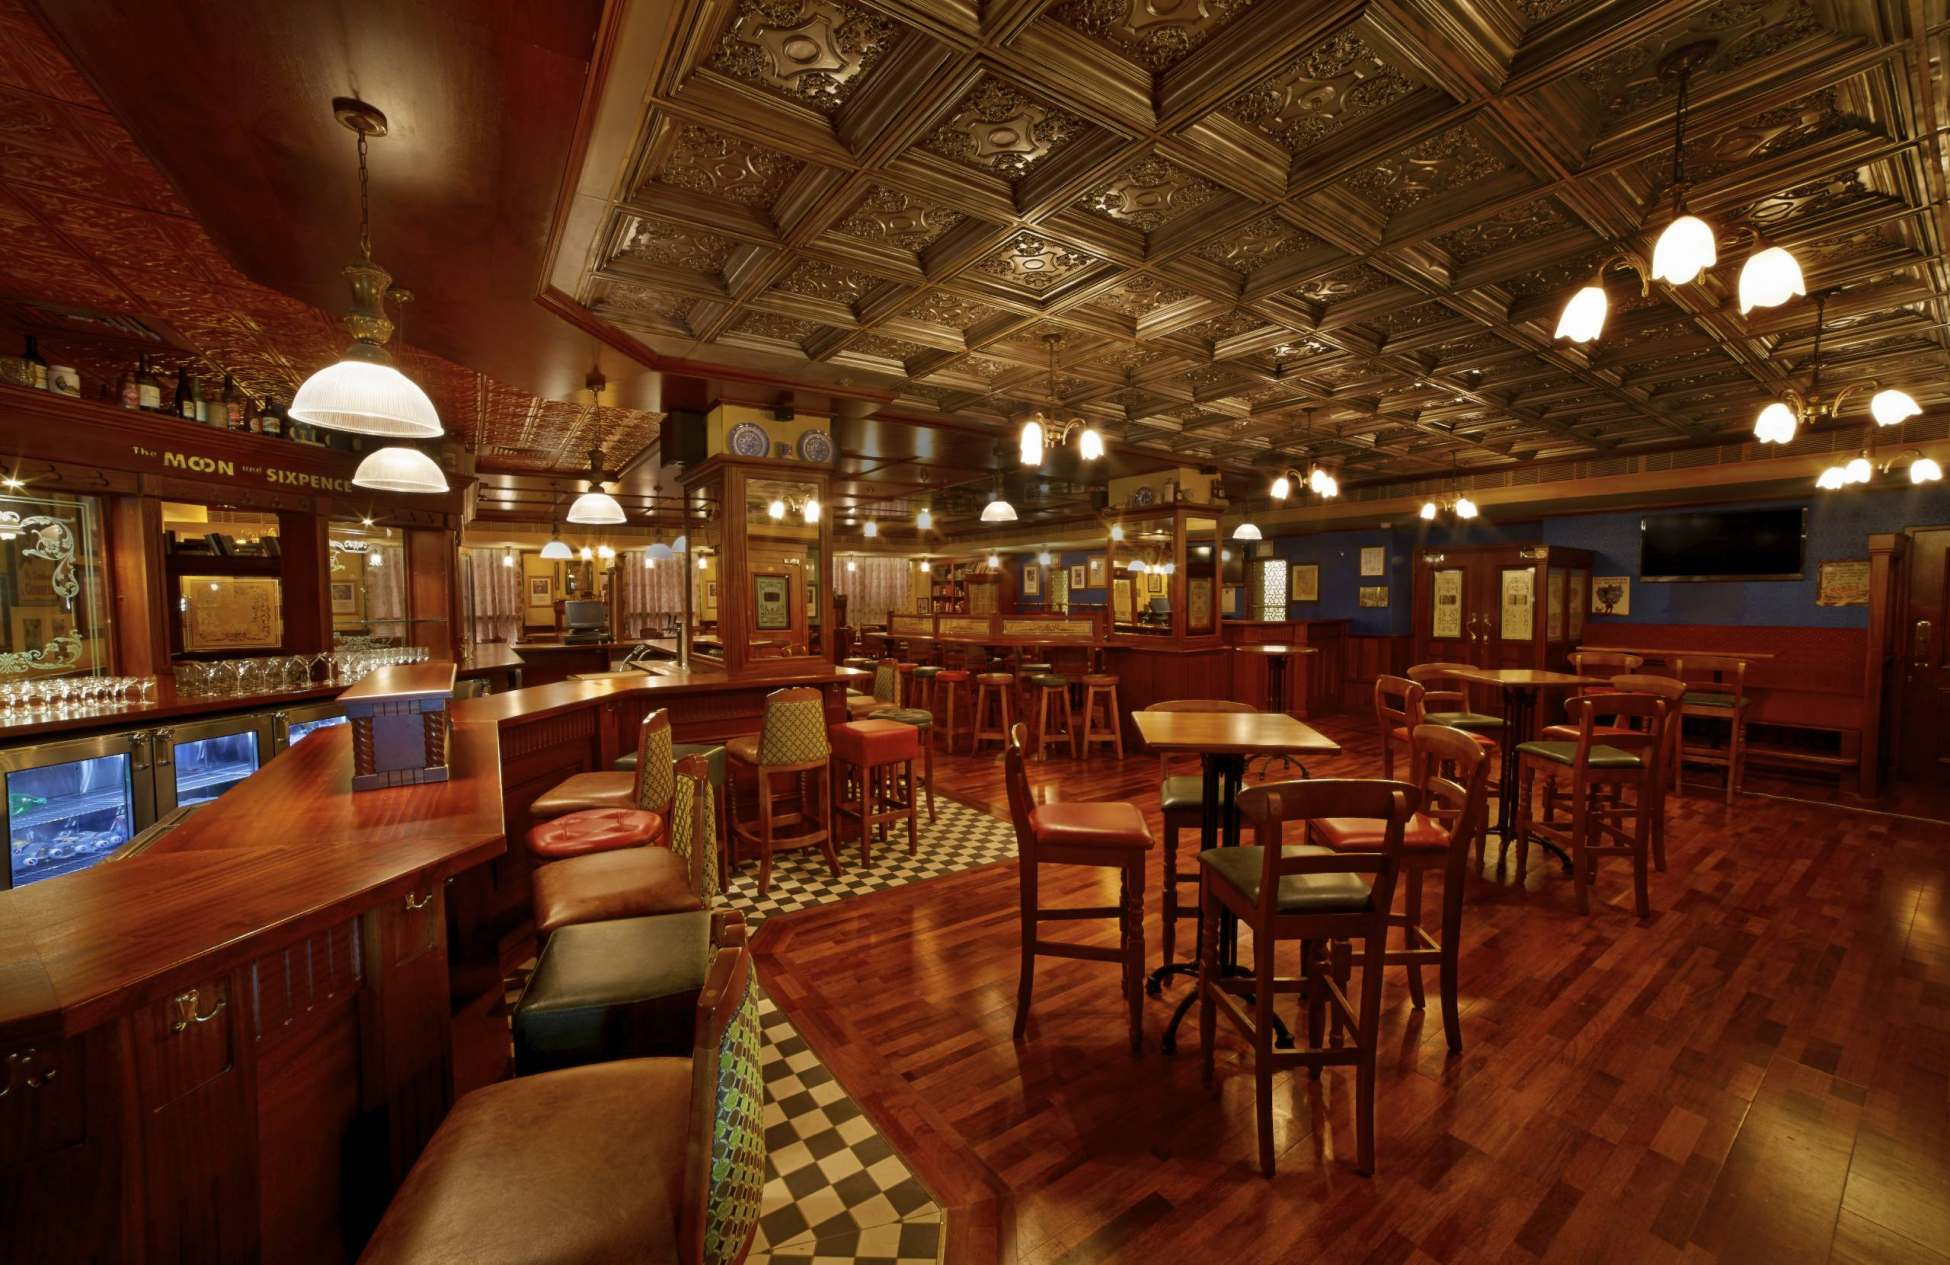 irish pub builder ol irish pubs irish pub company and irish pub design ol irish pubs. Black Bedroom Furniture Sets. Home Design Ideas